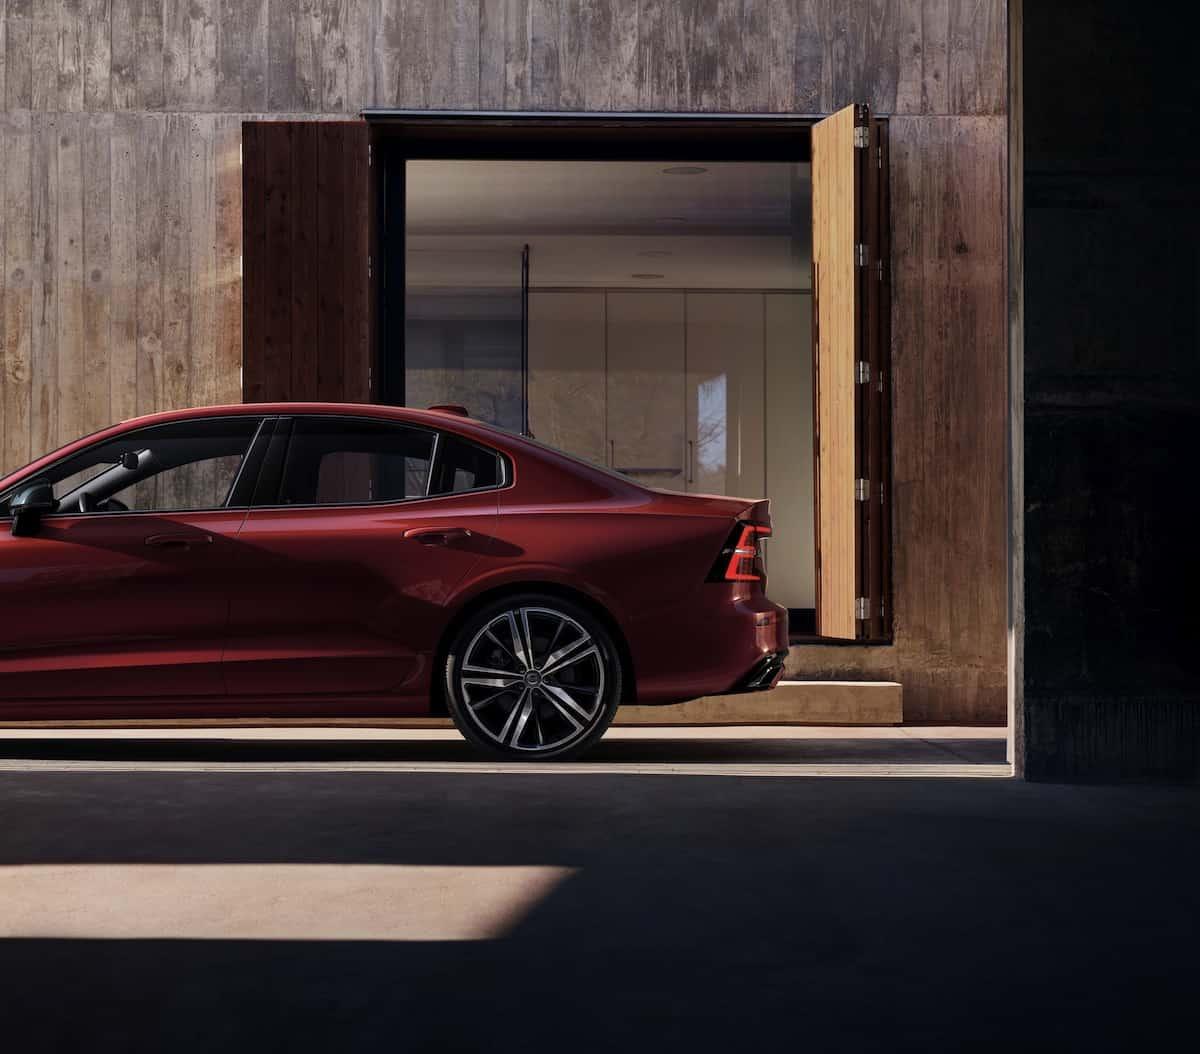 2019 volvo s60 sports sedan side view